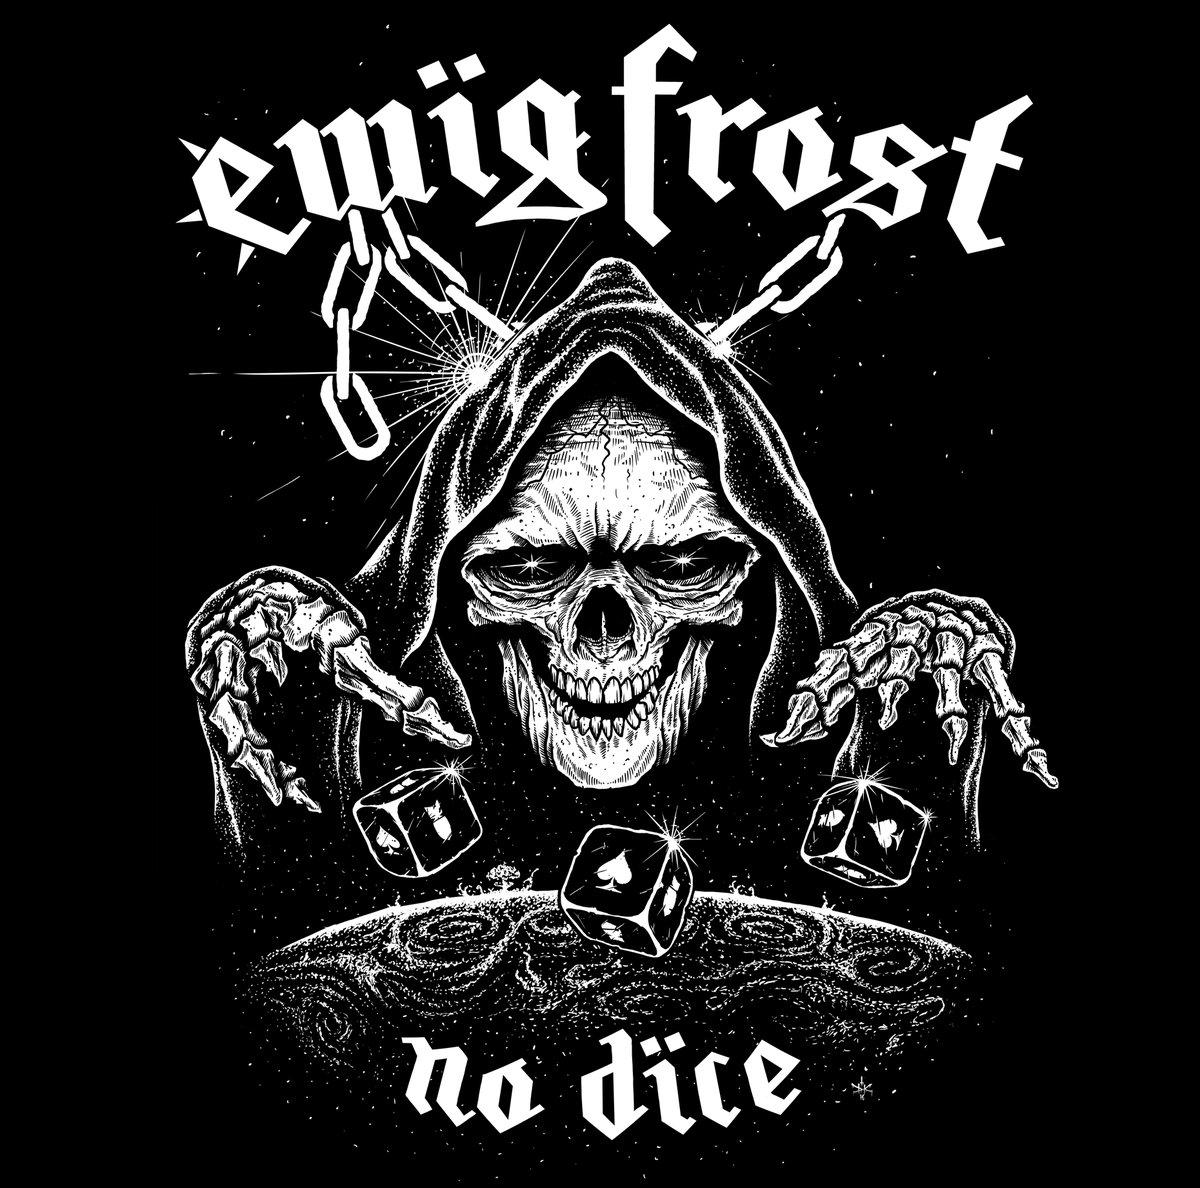 ewigfrost